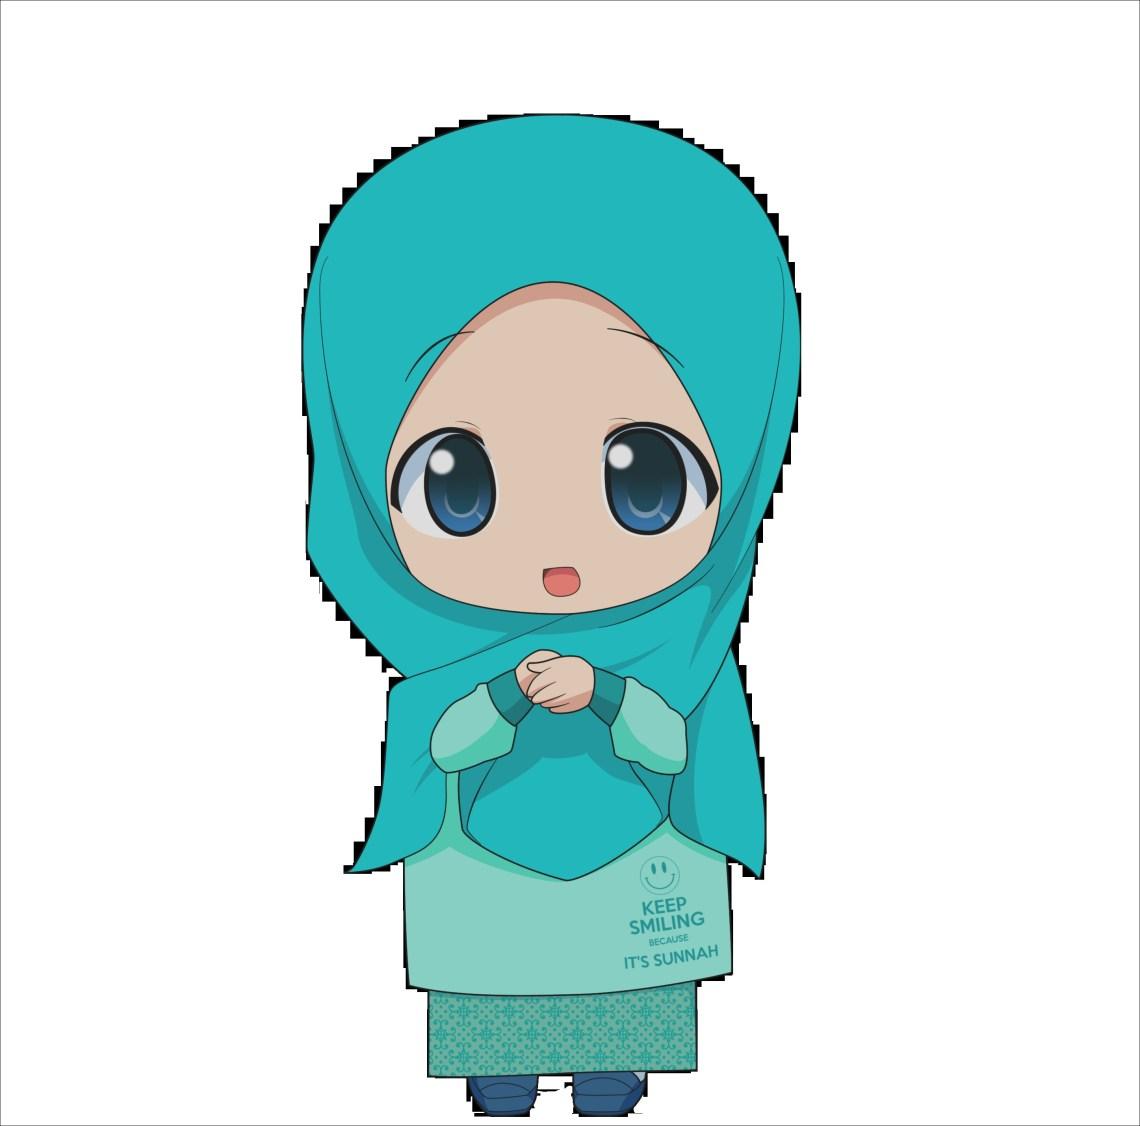 21 Gambar Kartun Muslimah Lucu Unik Imut Terbaru Kartun Muslimah